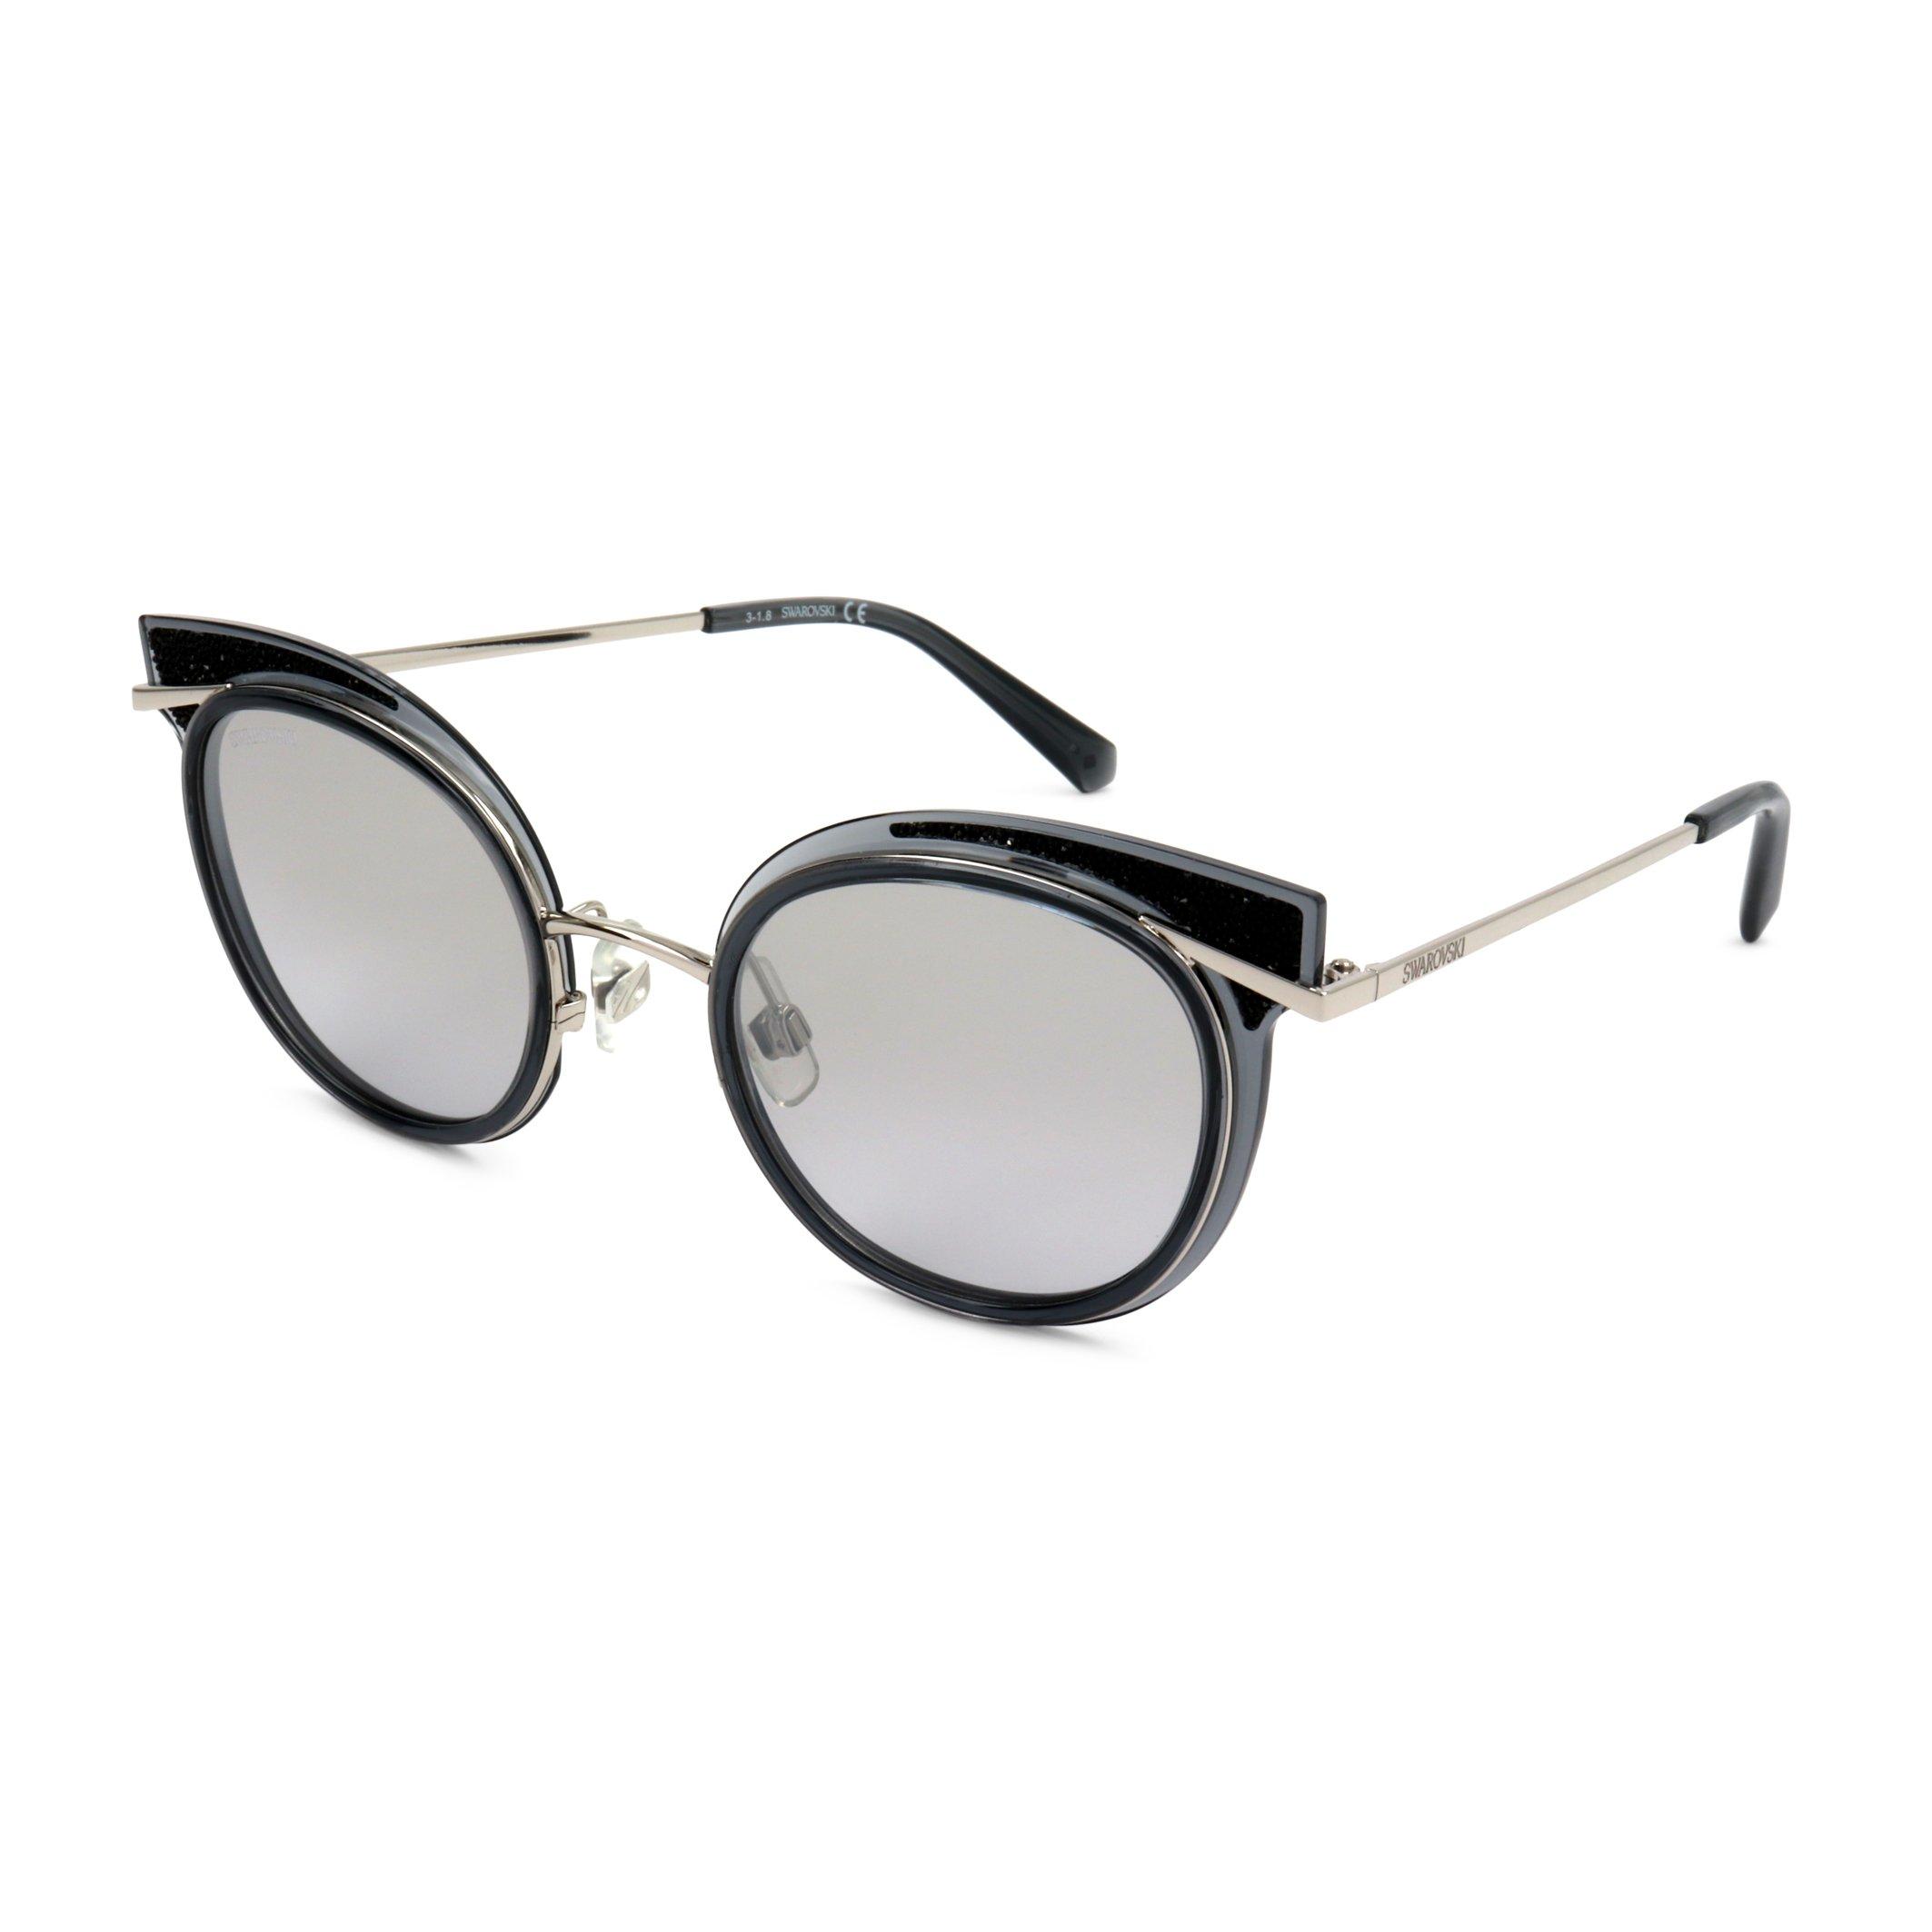 Swarovski Women's Sunglasses Violet SK0169 - grey NOSIZE